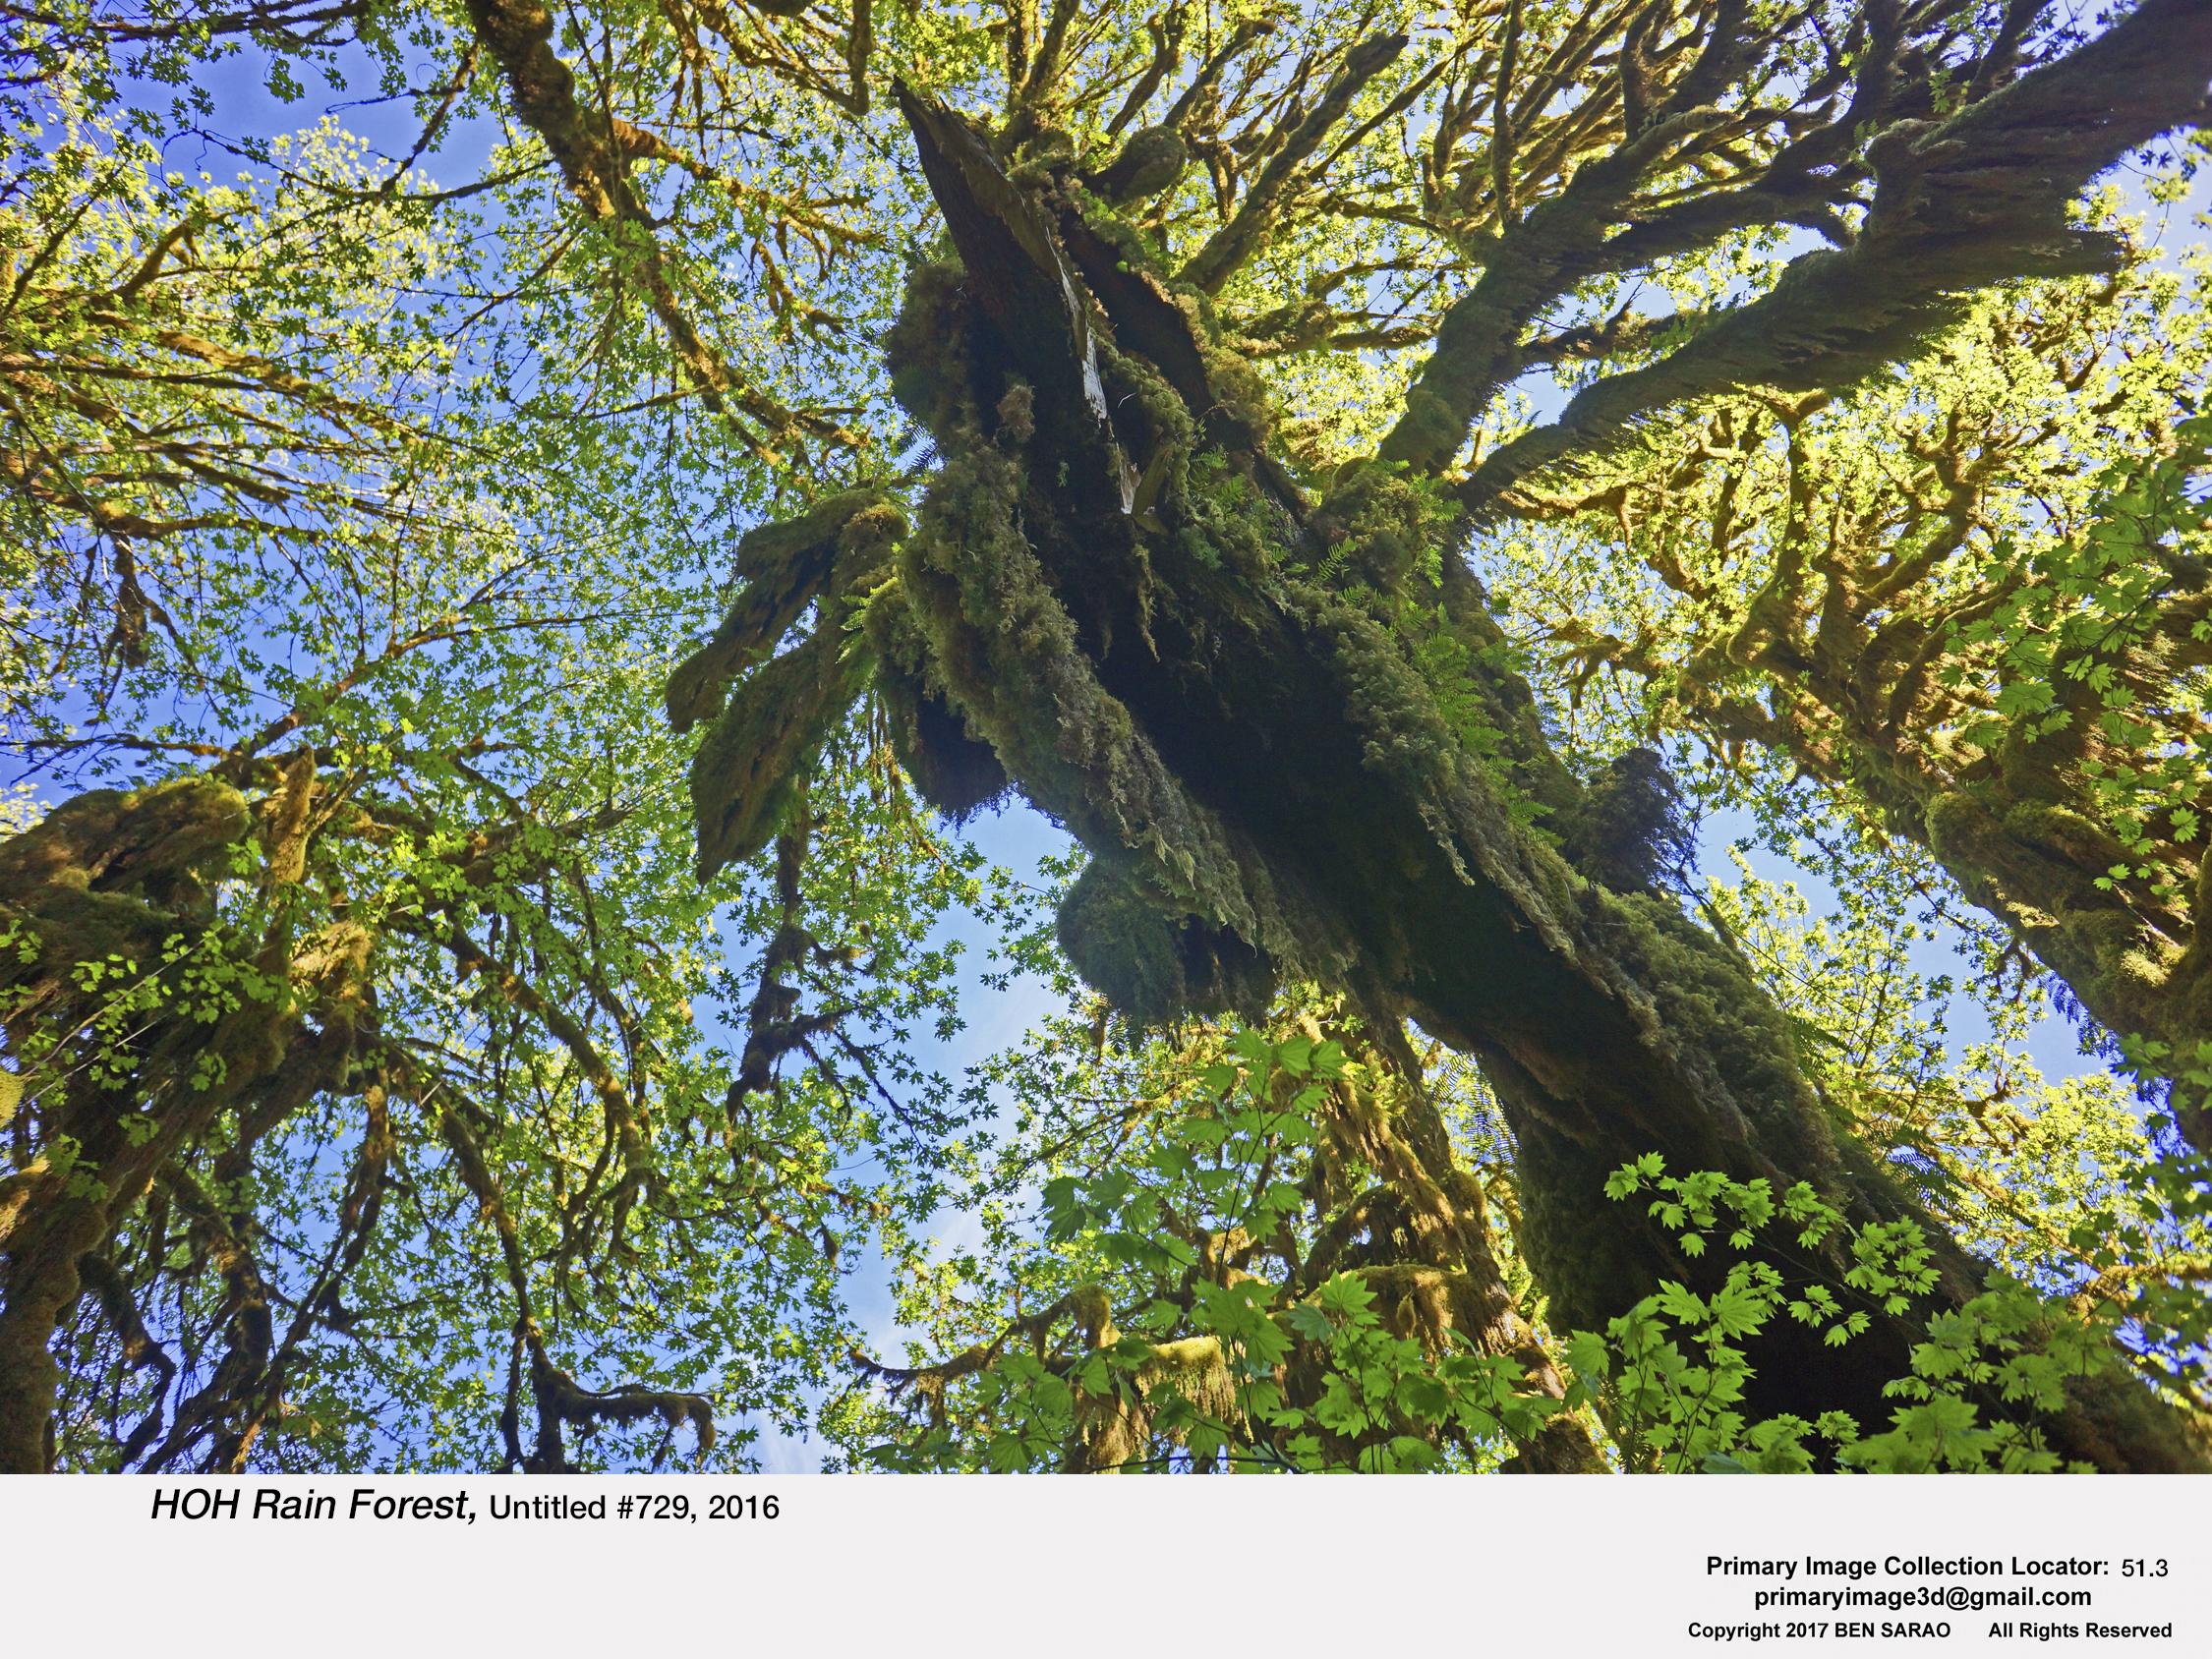 6. HOH Rain Forest 729.jpg